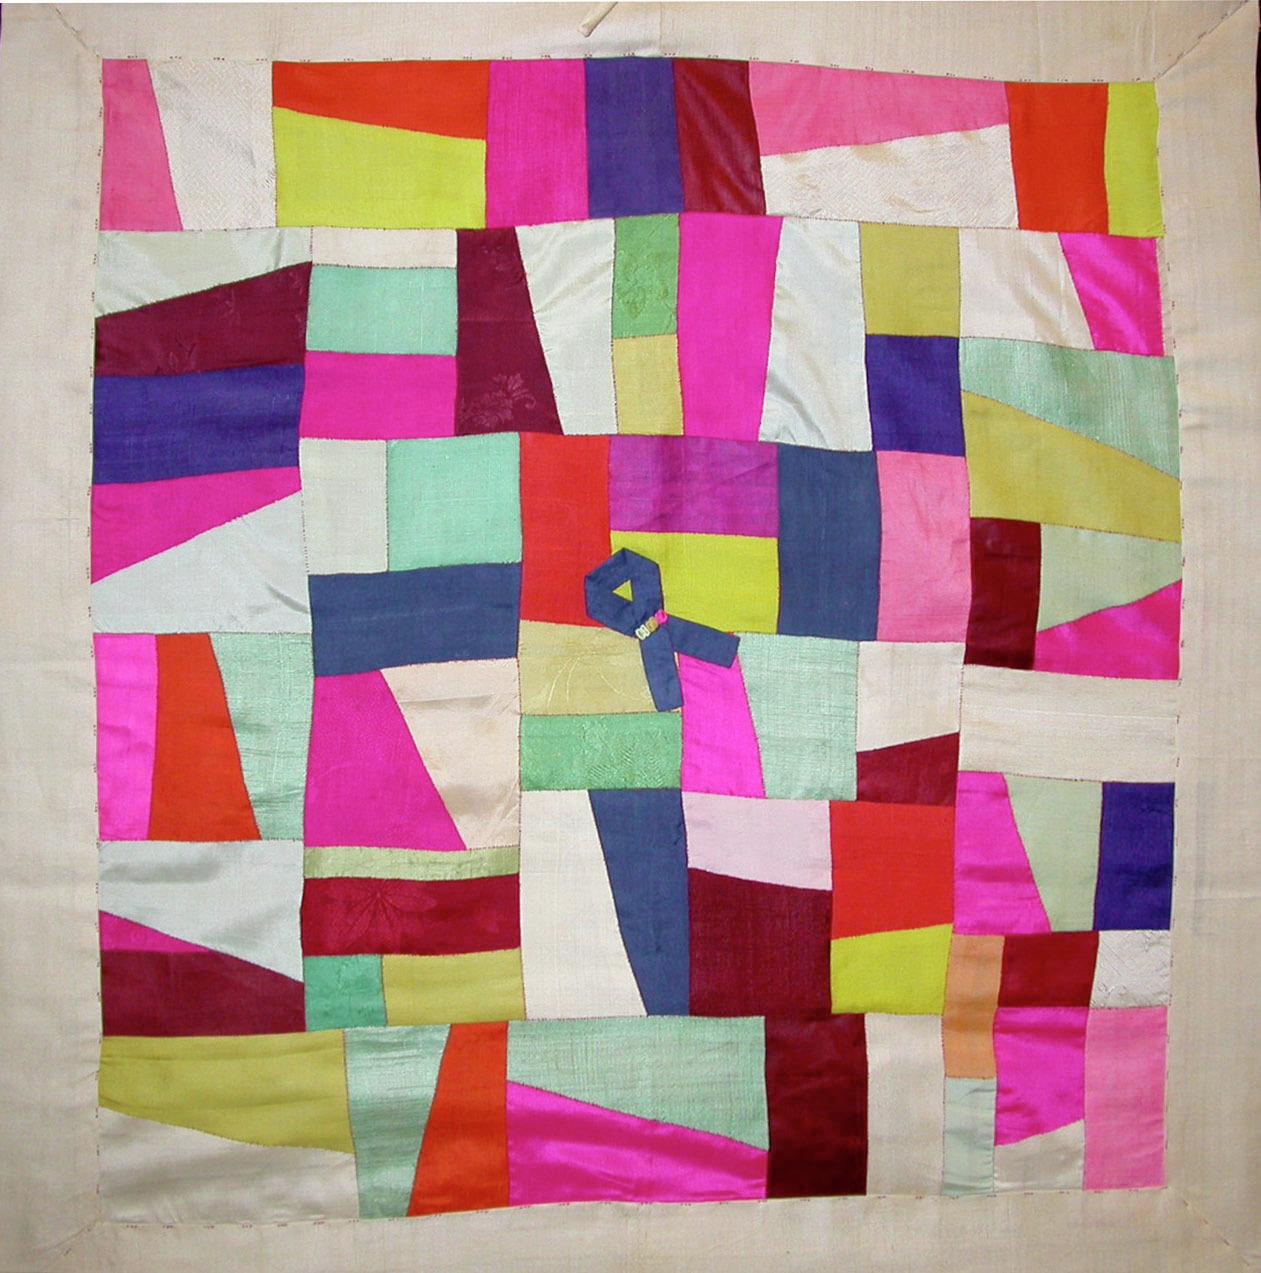 Multi-Colored Wrapping Cloth (Bojagi), Korea, silk and cotton